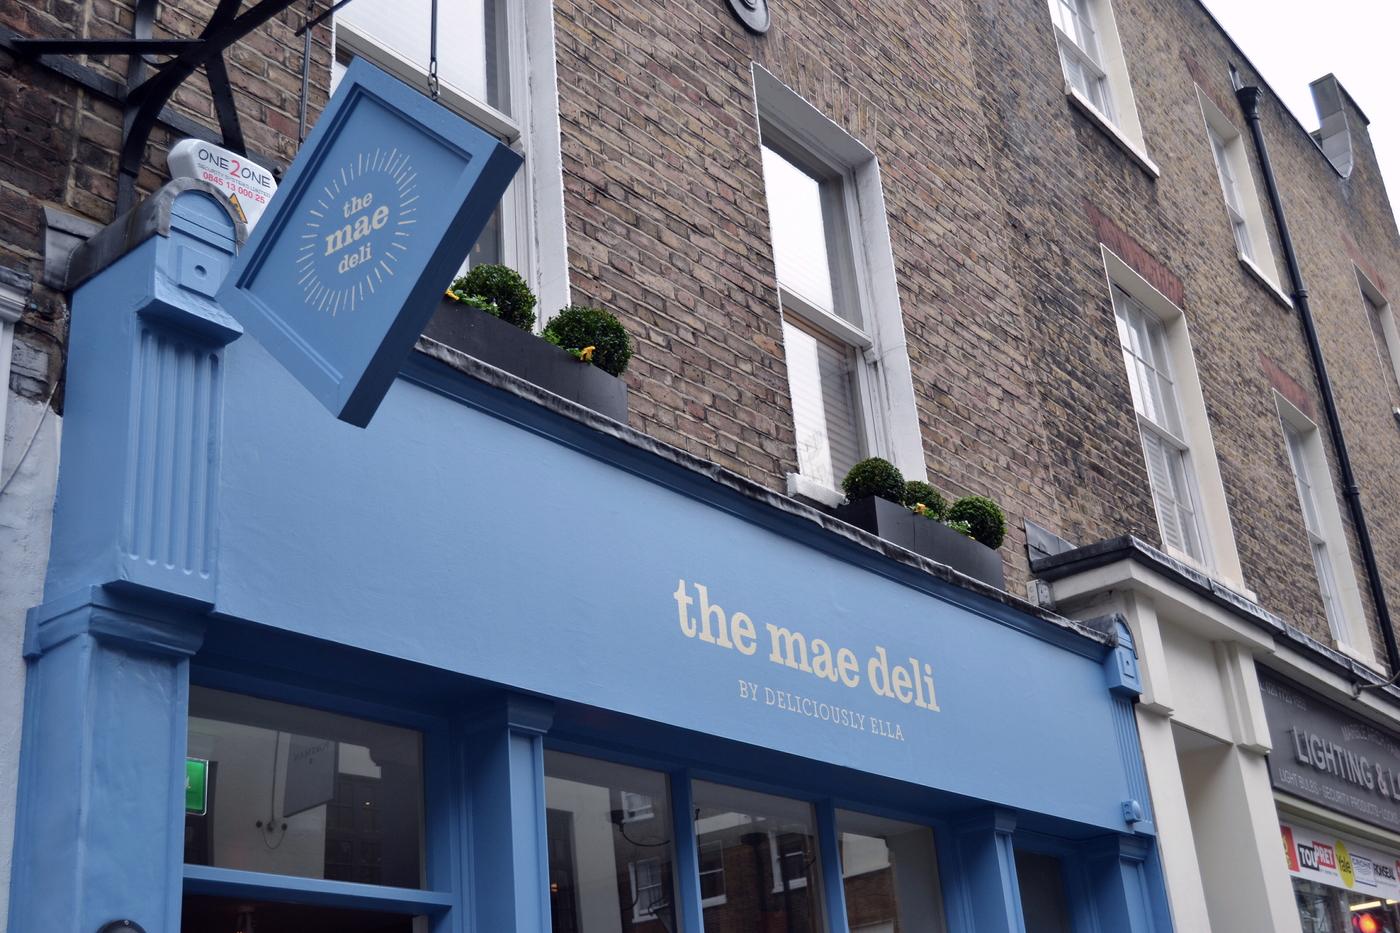 the mae deli -place to go